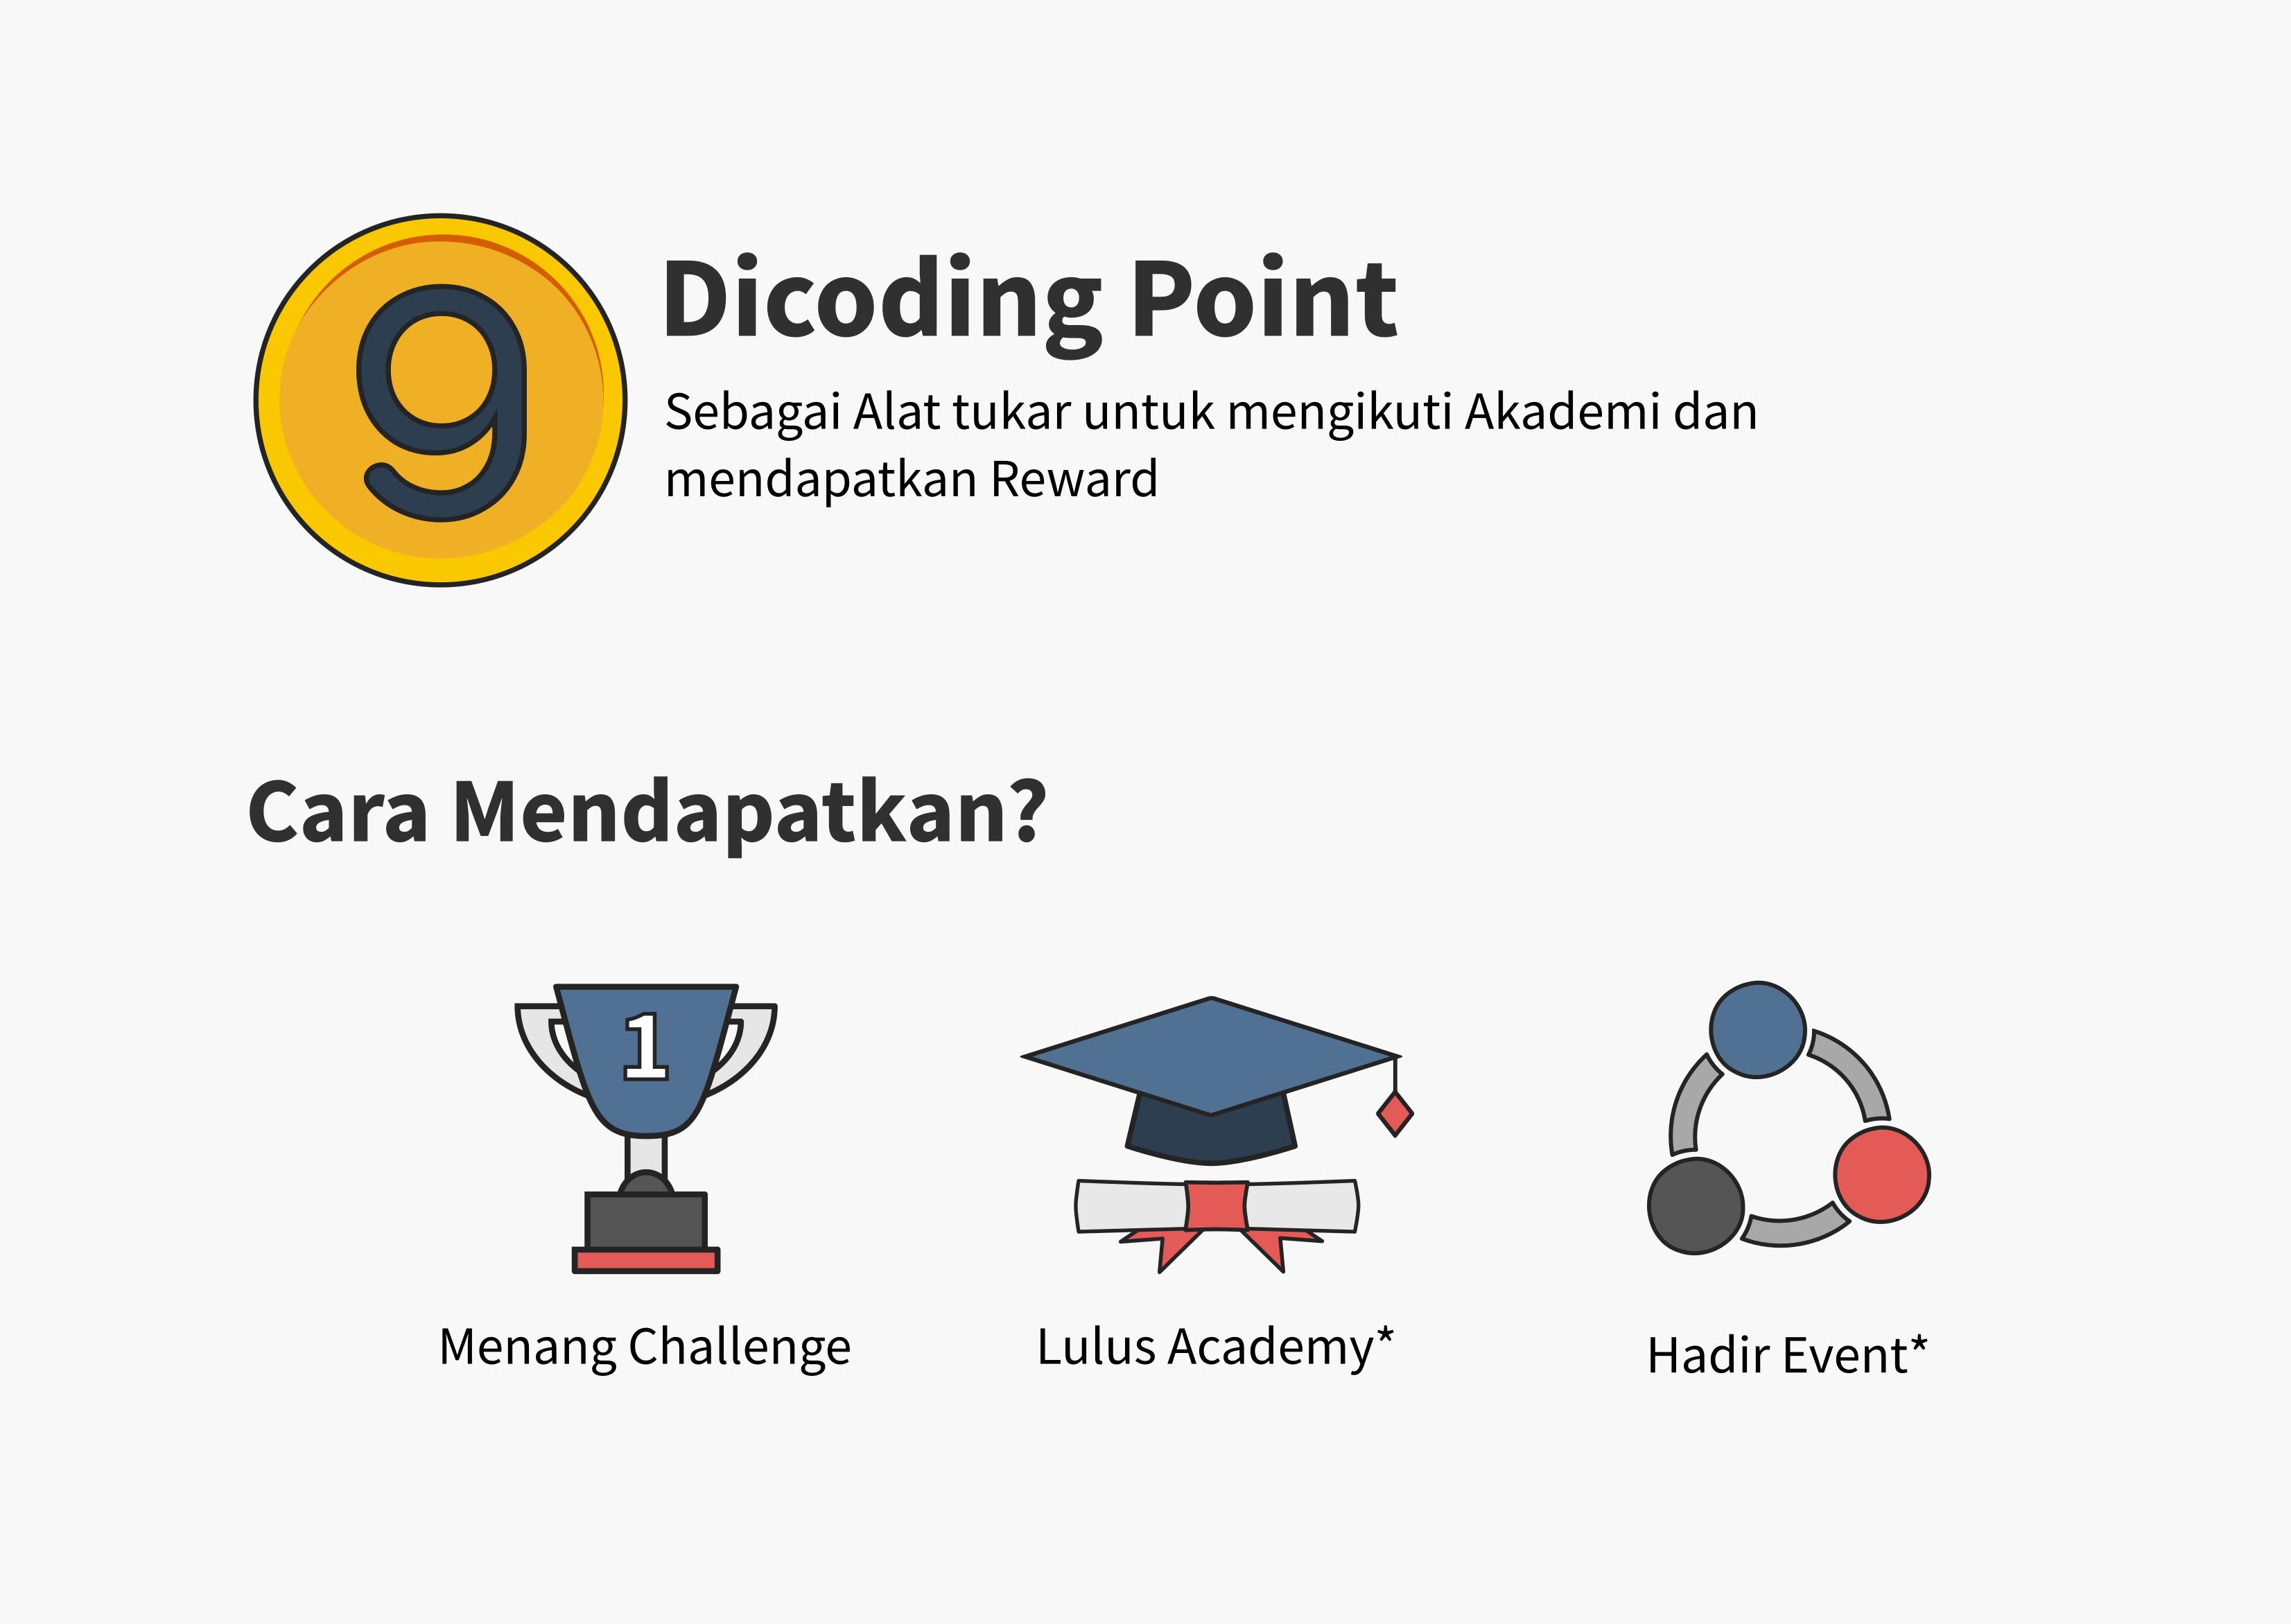 Apa itu Dicoding Point?